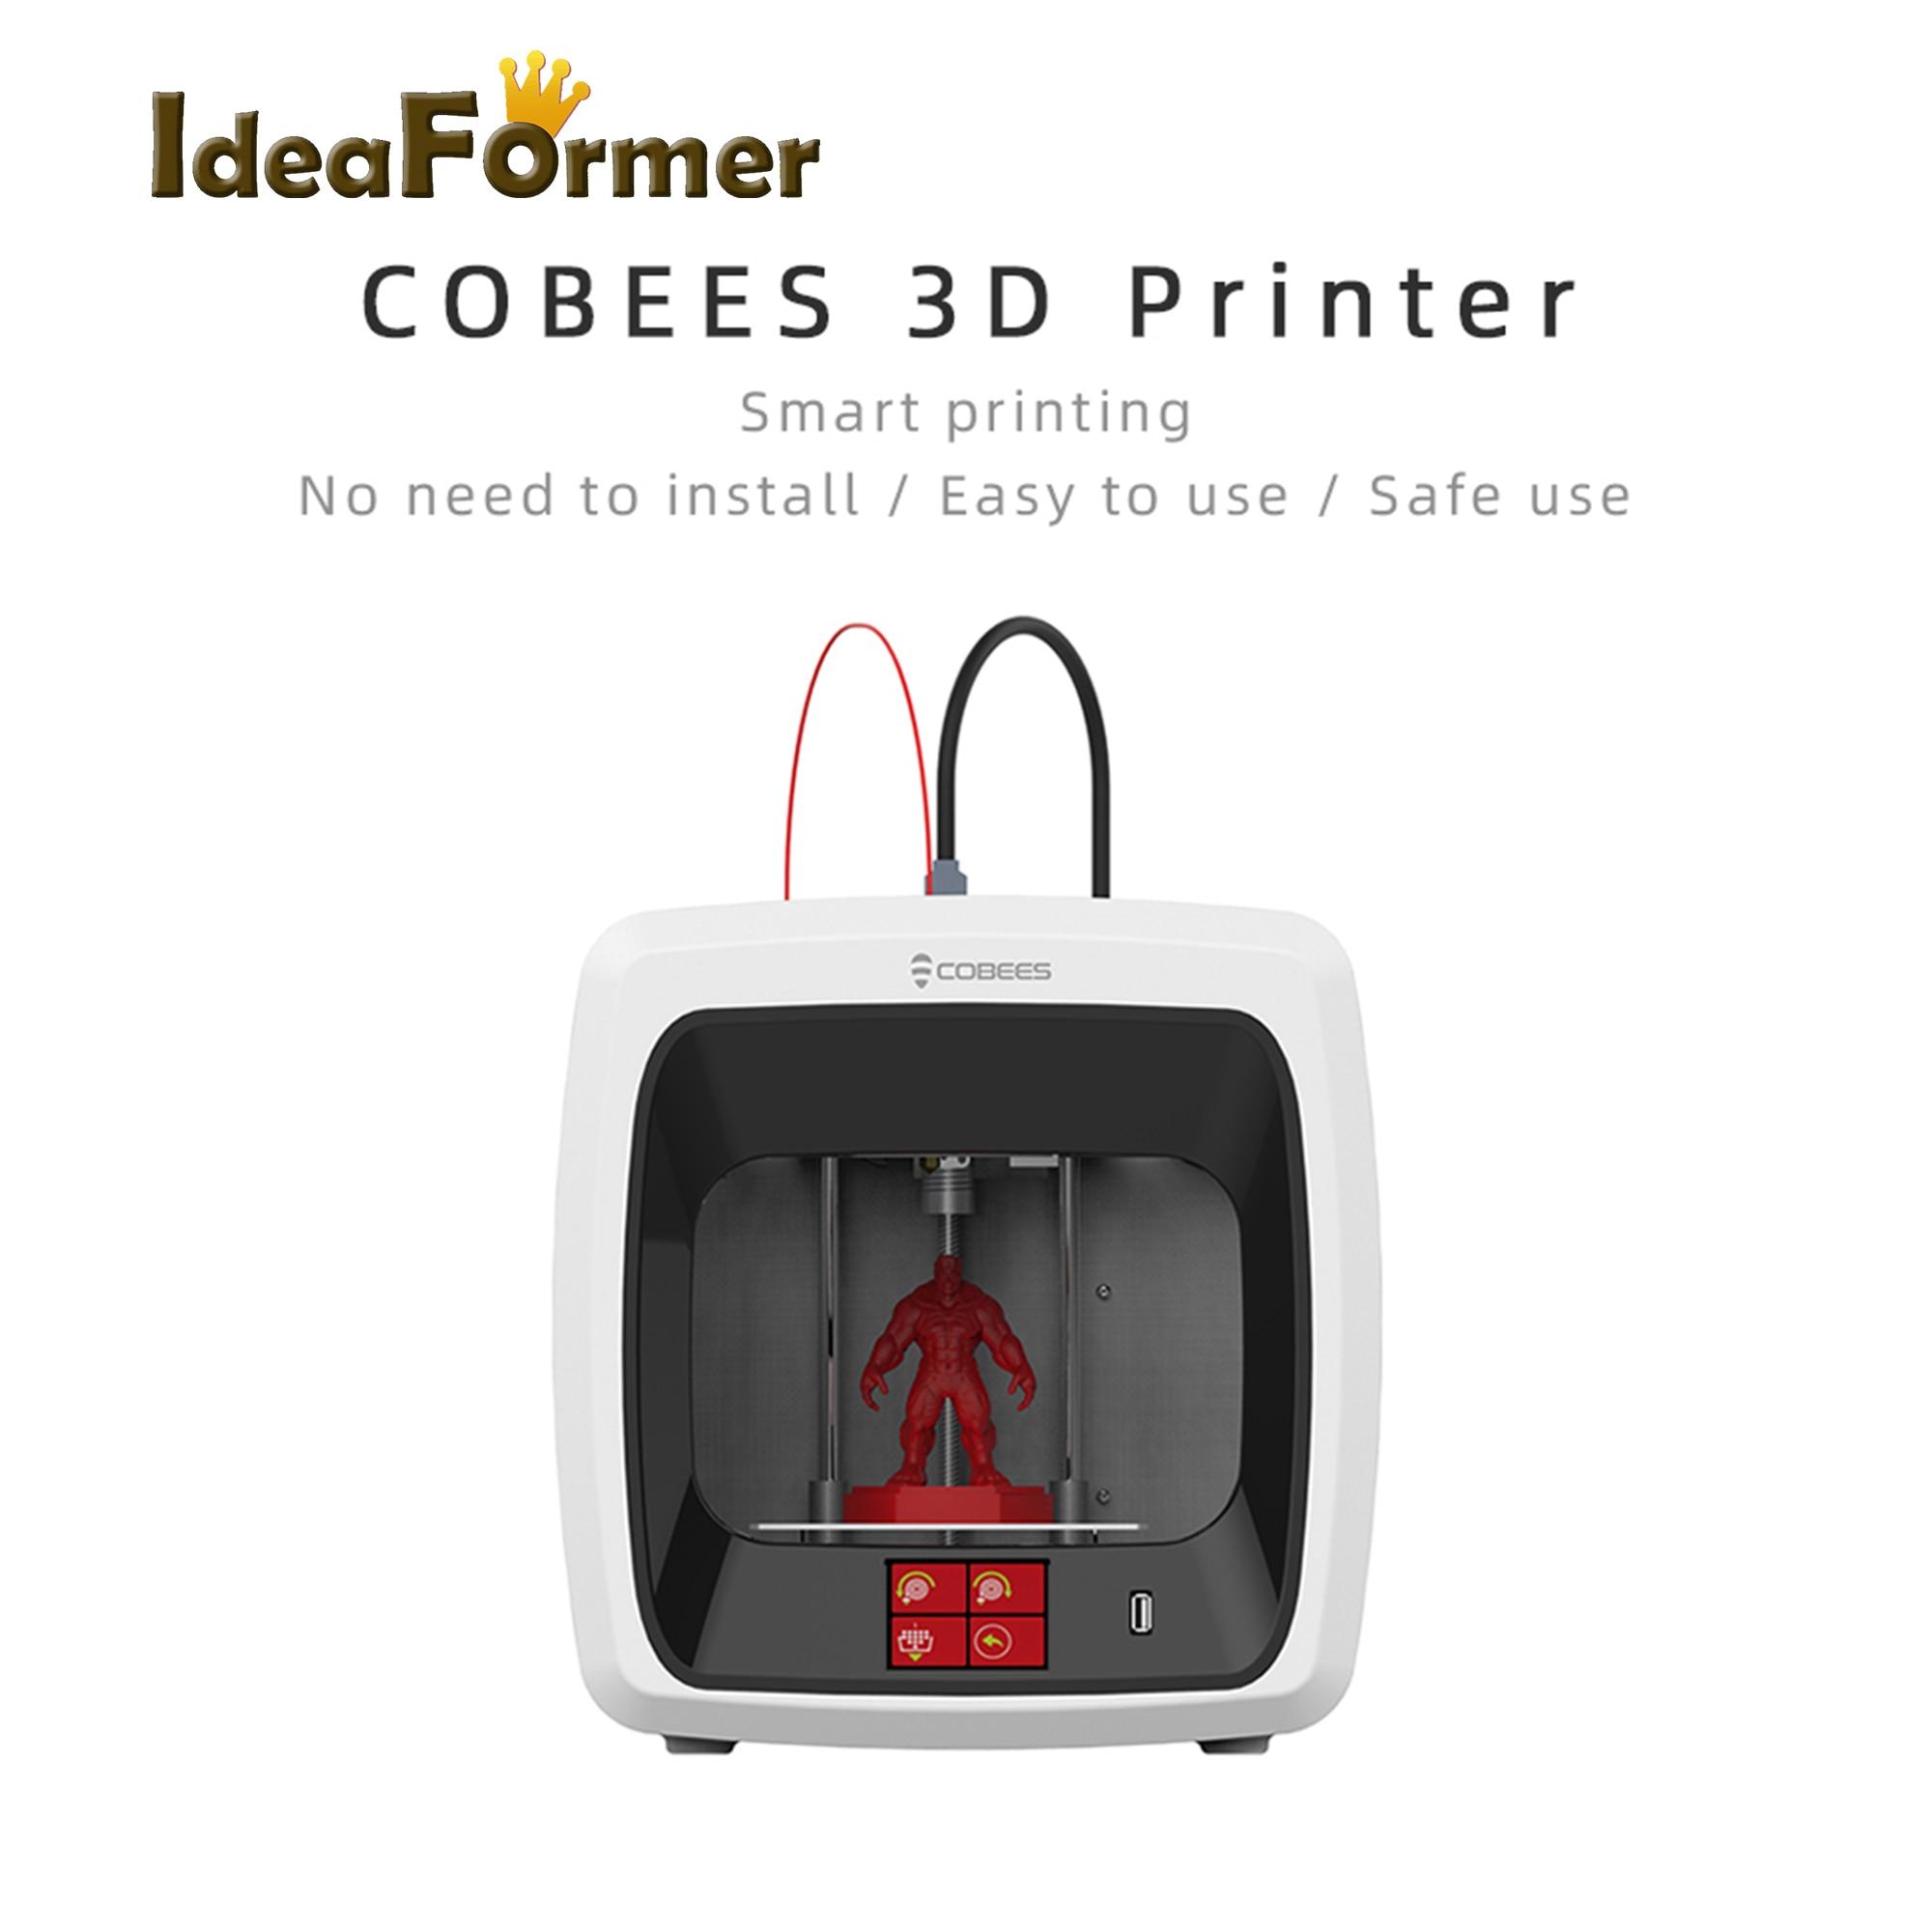 Ideaformer drukarka 3D cobees desktop CoreXY struktura wysoka precyzja easyuse Mini FDM drukarka 3D dla dzieci prezent edukacja i rodzina